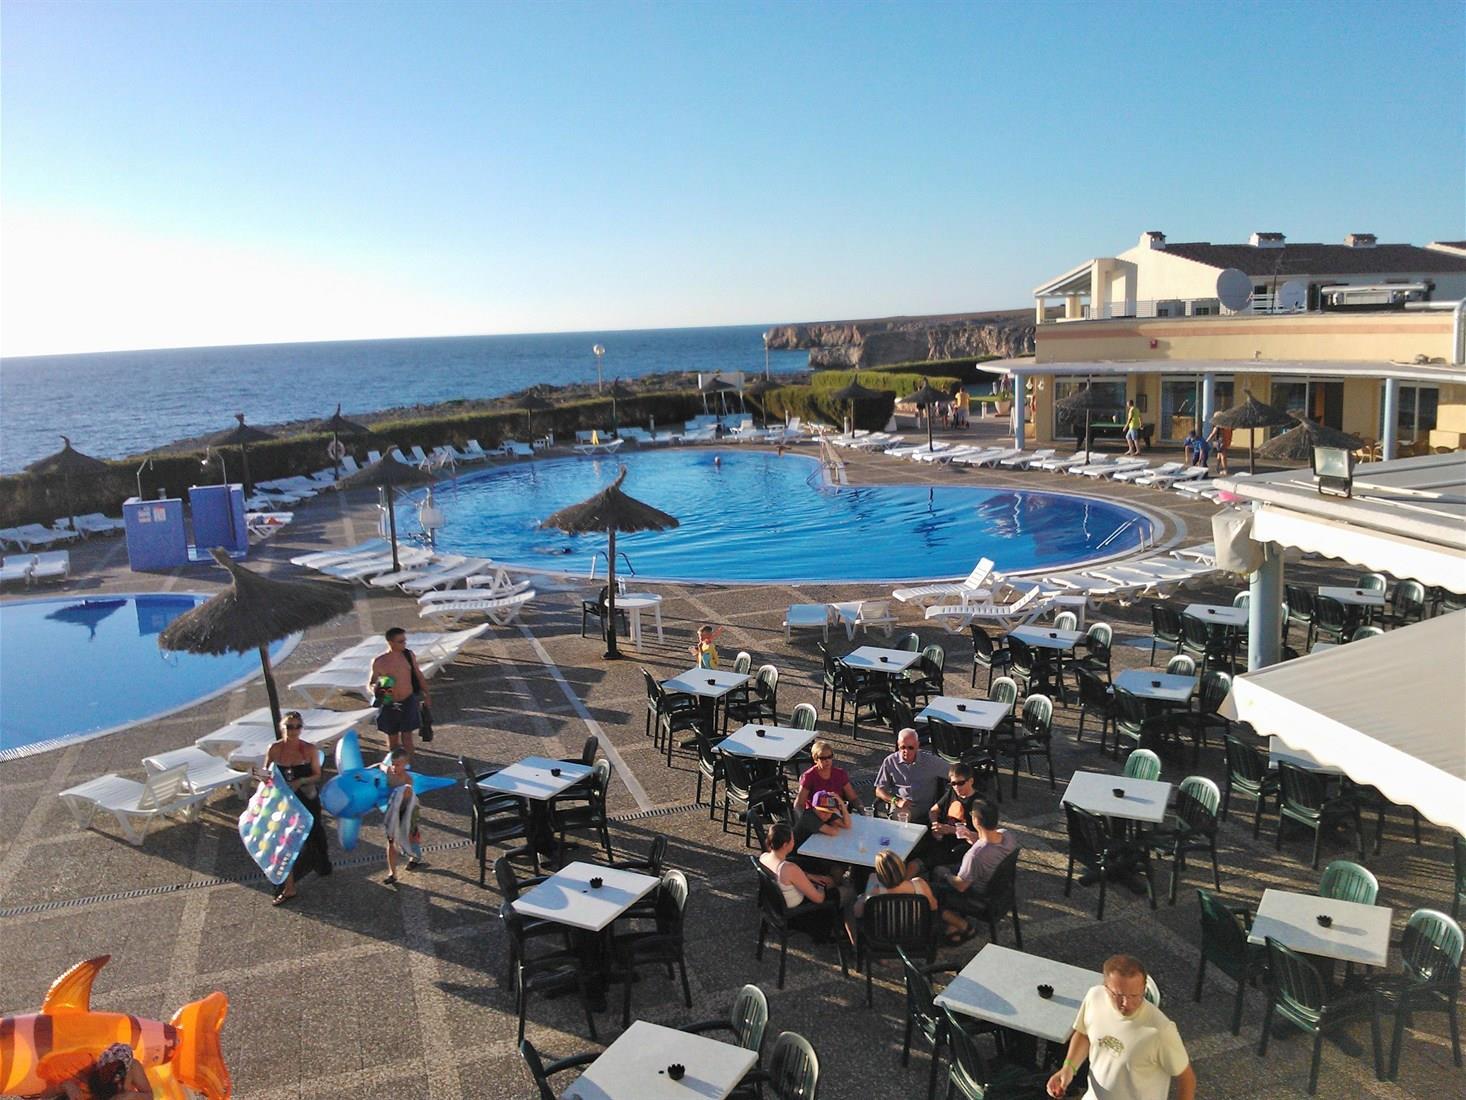 Zdj cia z aparthotel sea club for Aparthotel corse